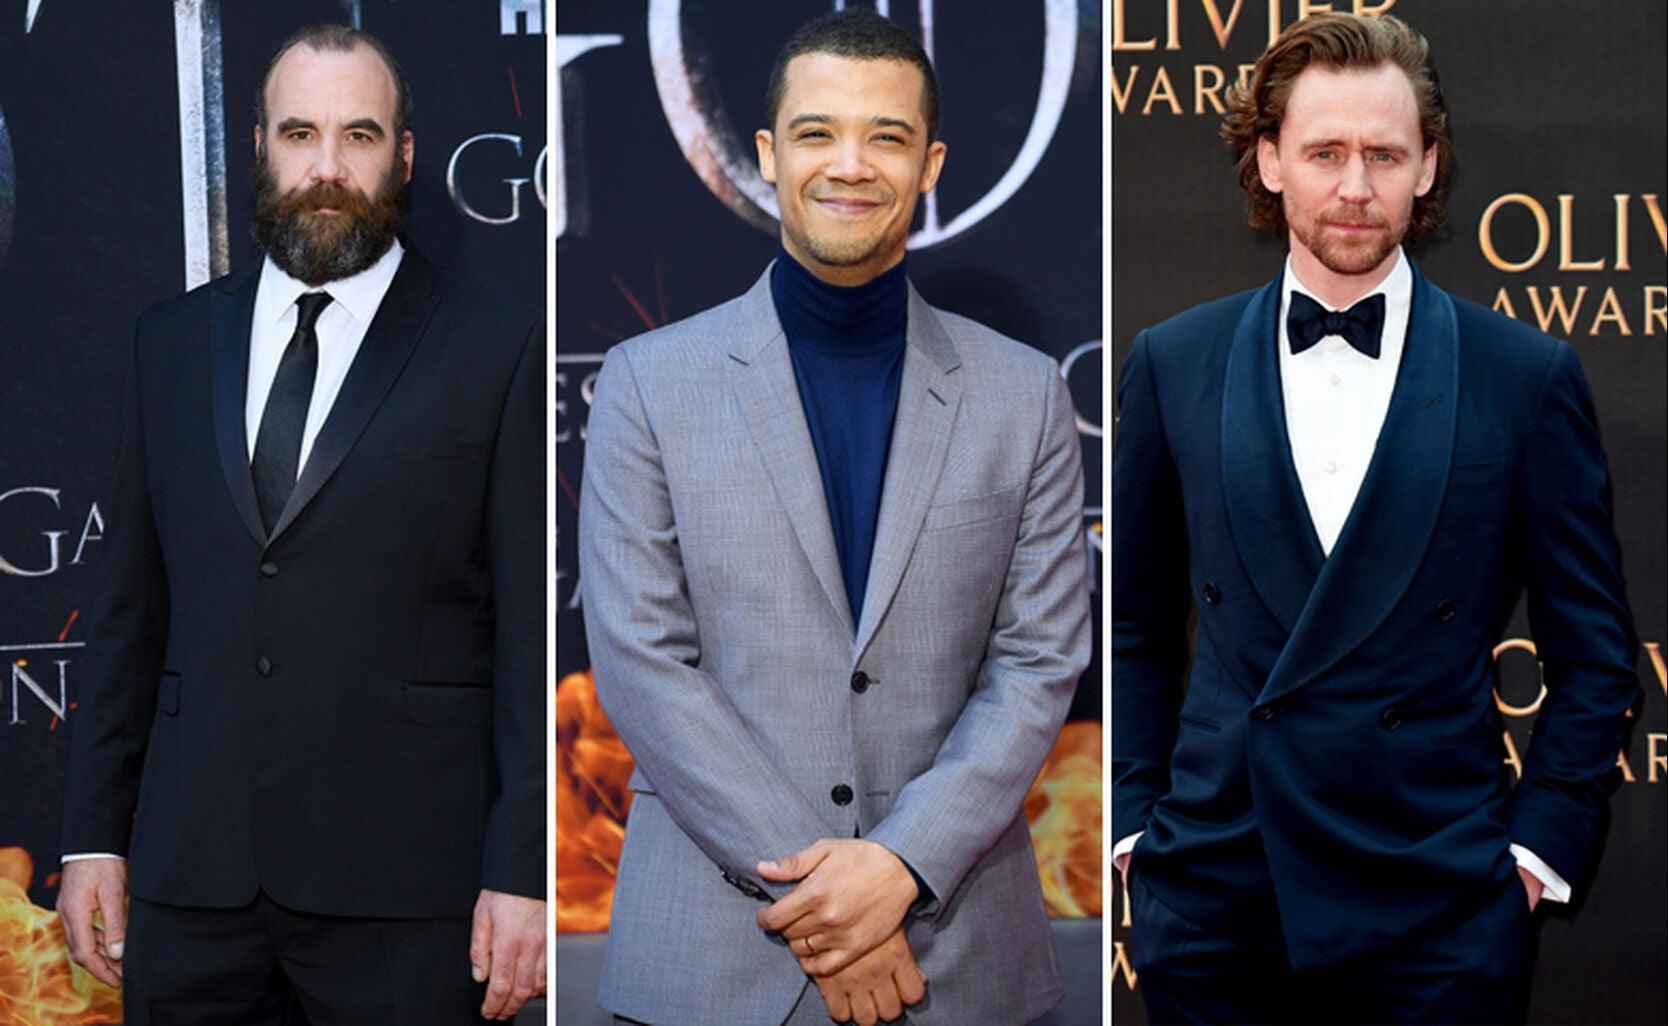 Rory McCann, Jacob Anderson, Tom Hiddleston